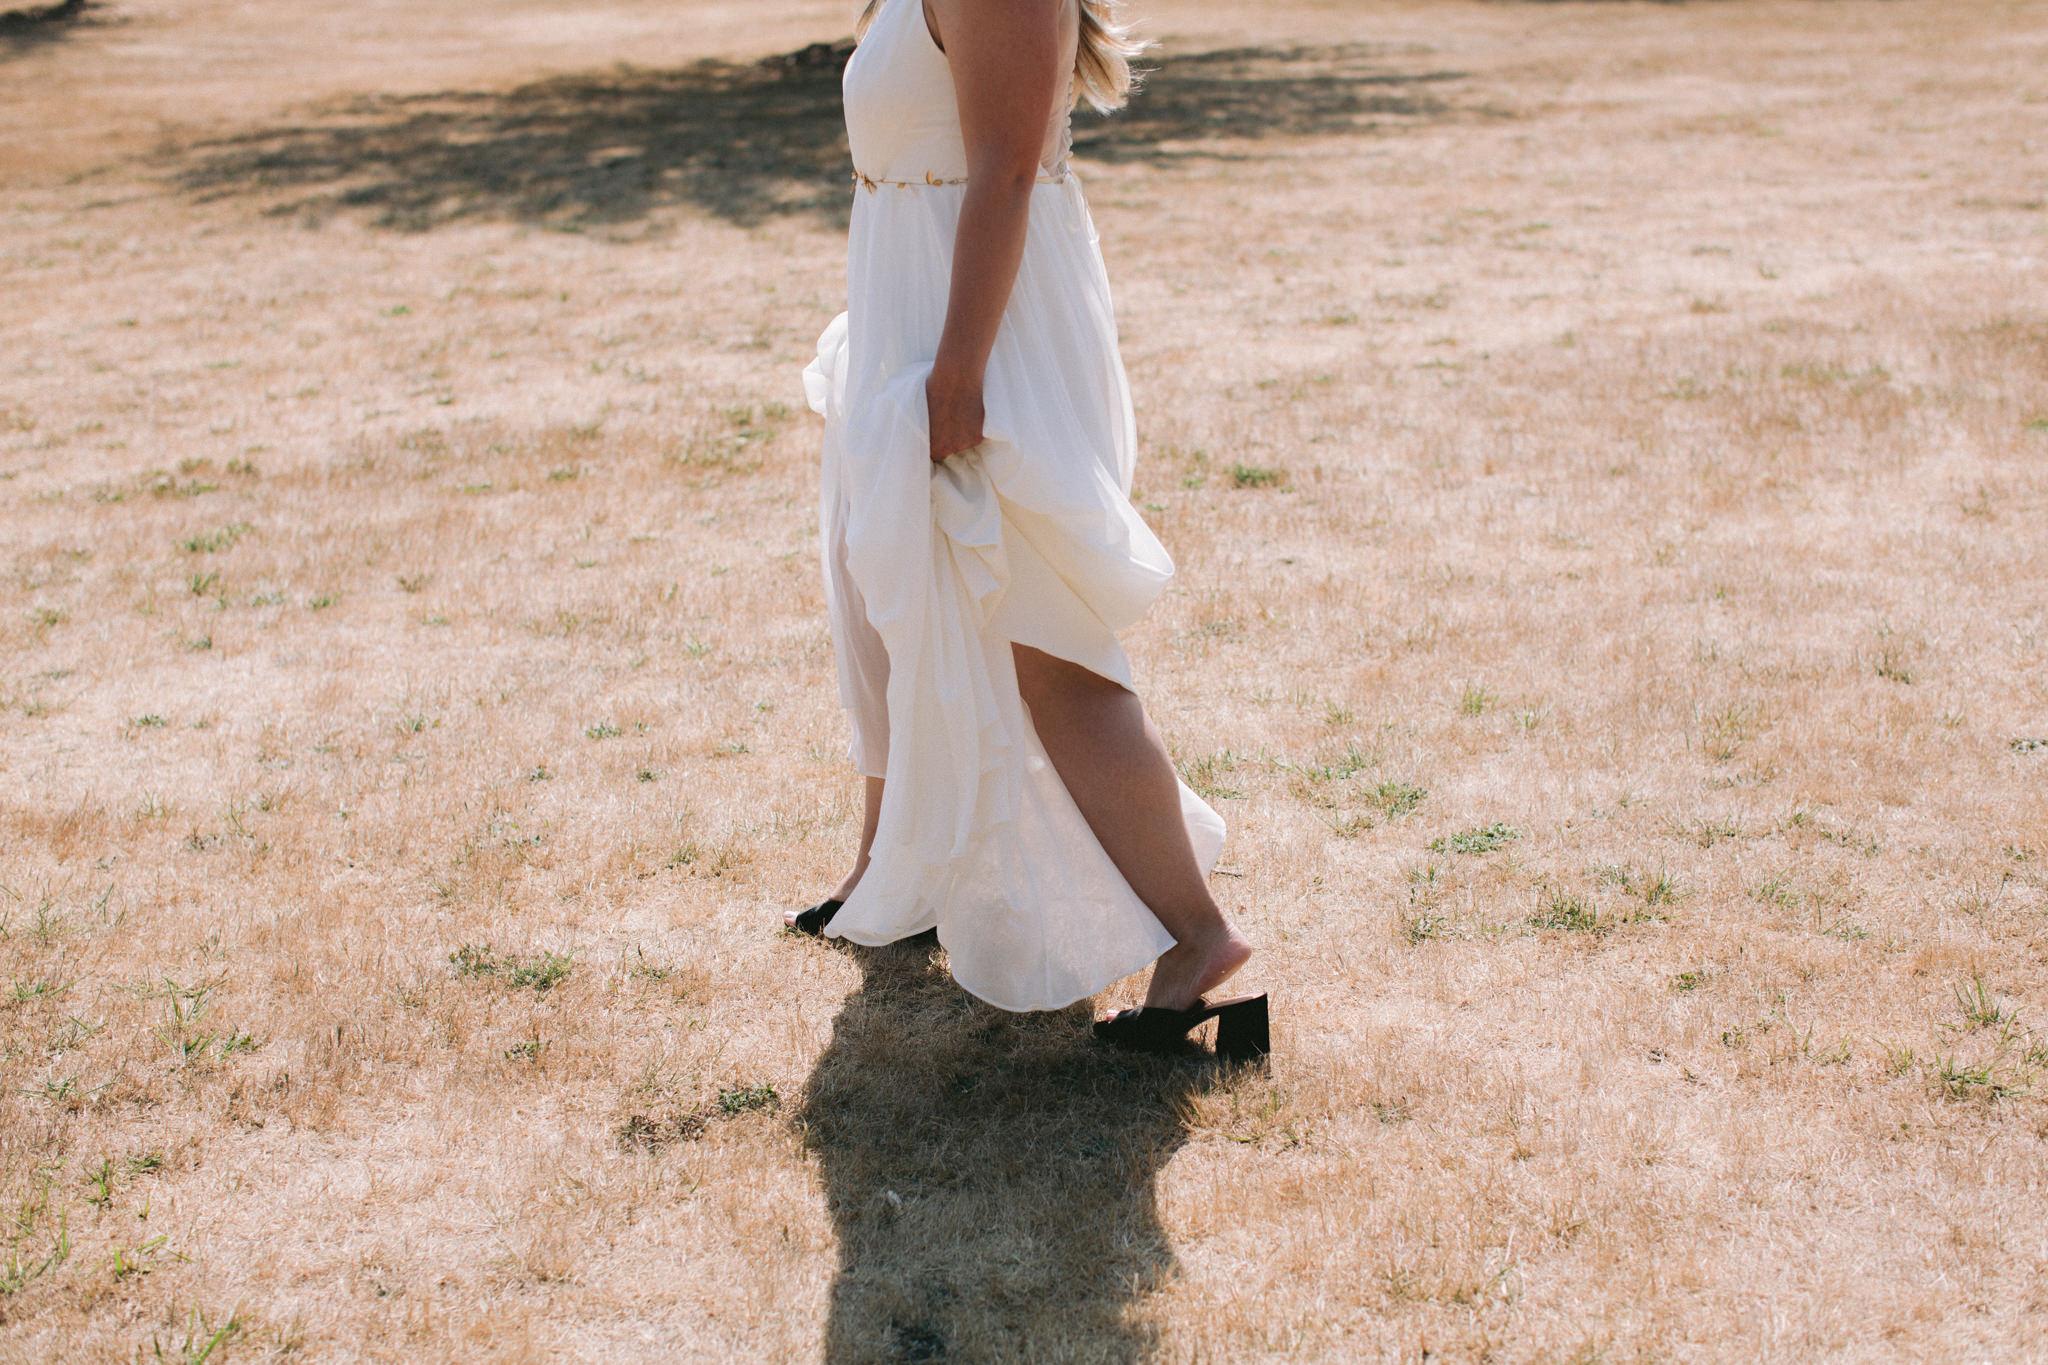 Backyard-Bainbridge-Island-Wedding-Alycia-Lovell-Photography-42.JPG